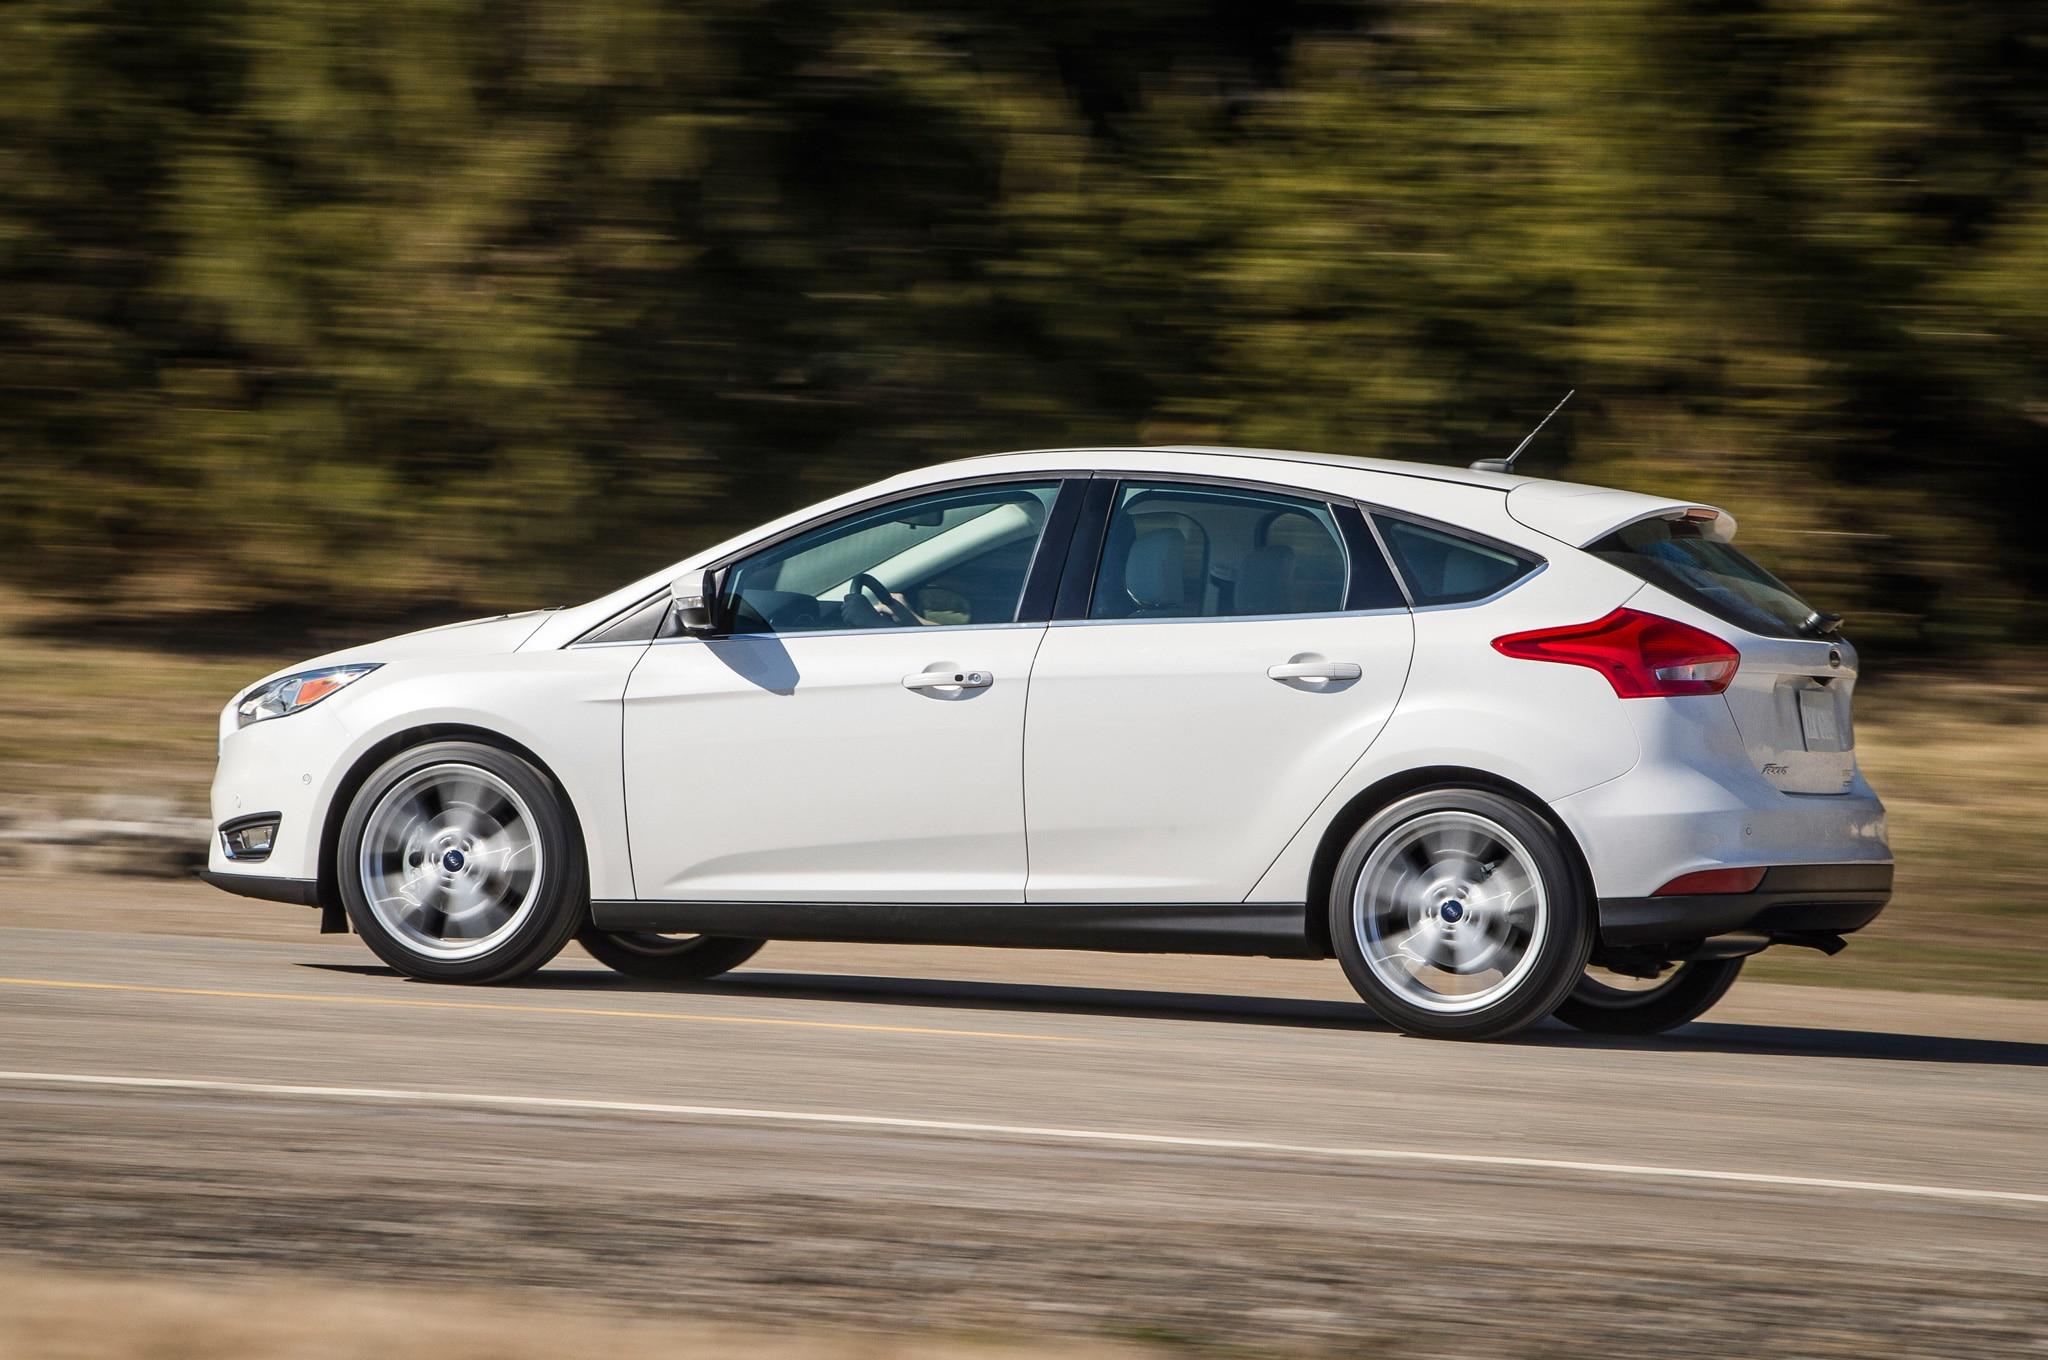 2015 ford focus hatchback side motion view on road